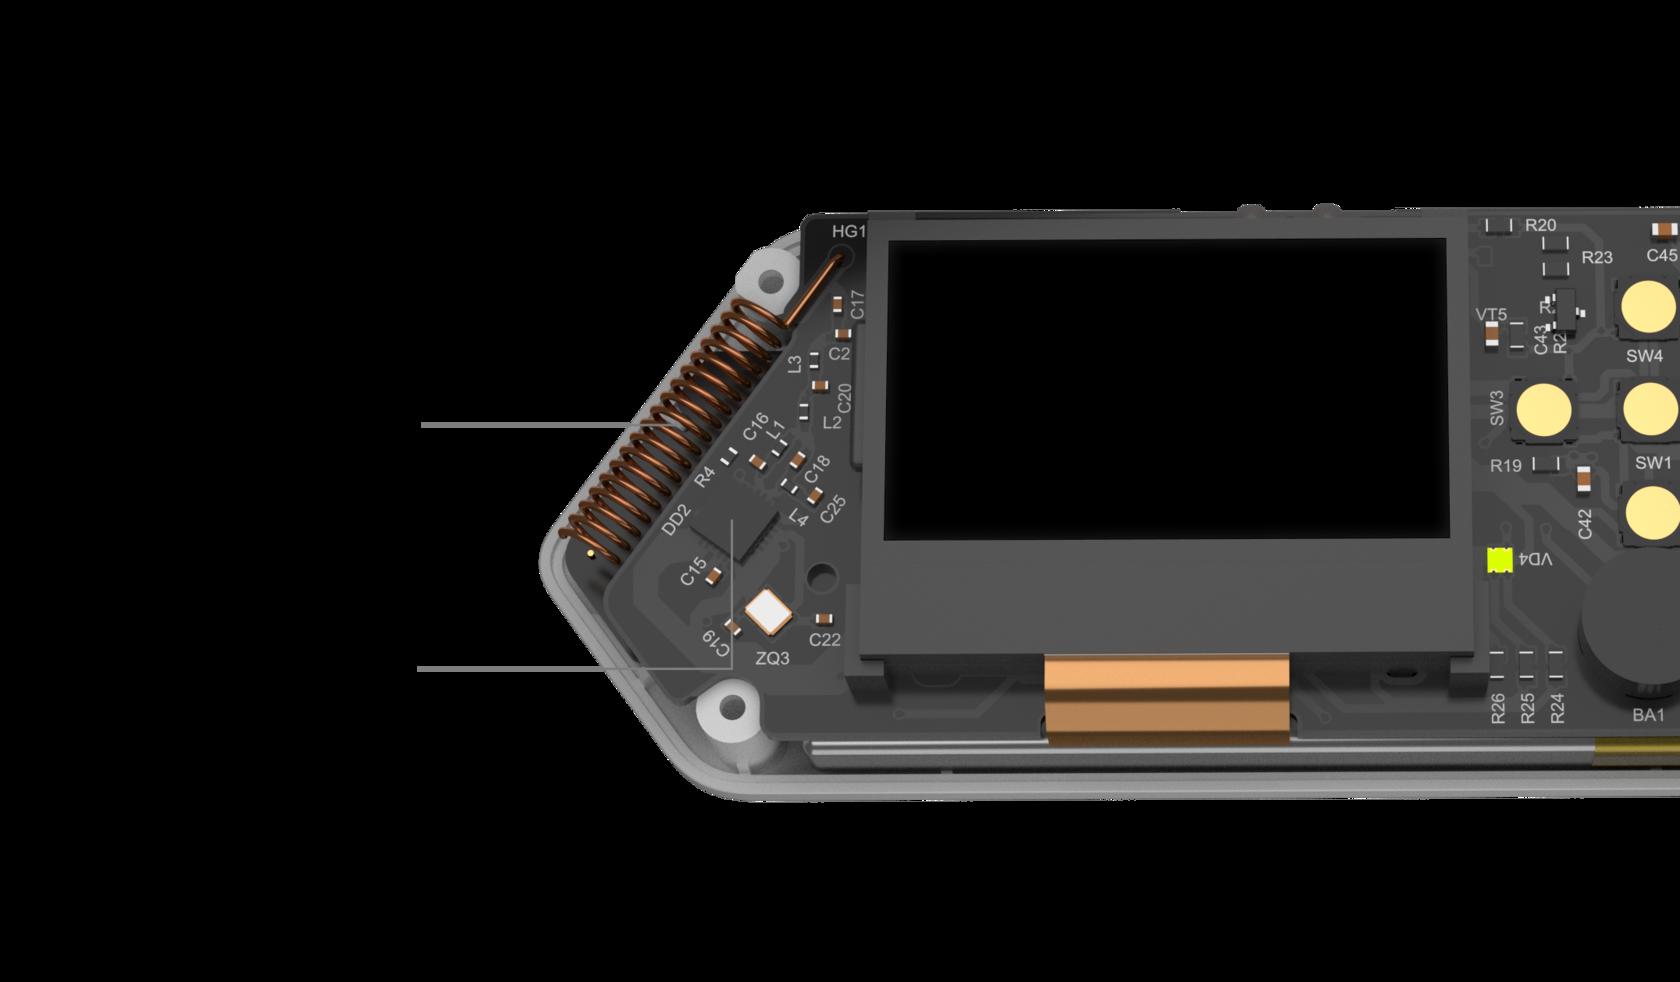 Flipper Zero CC1101 radio chipset